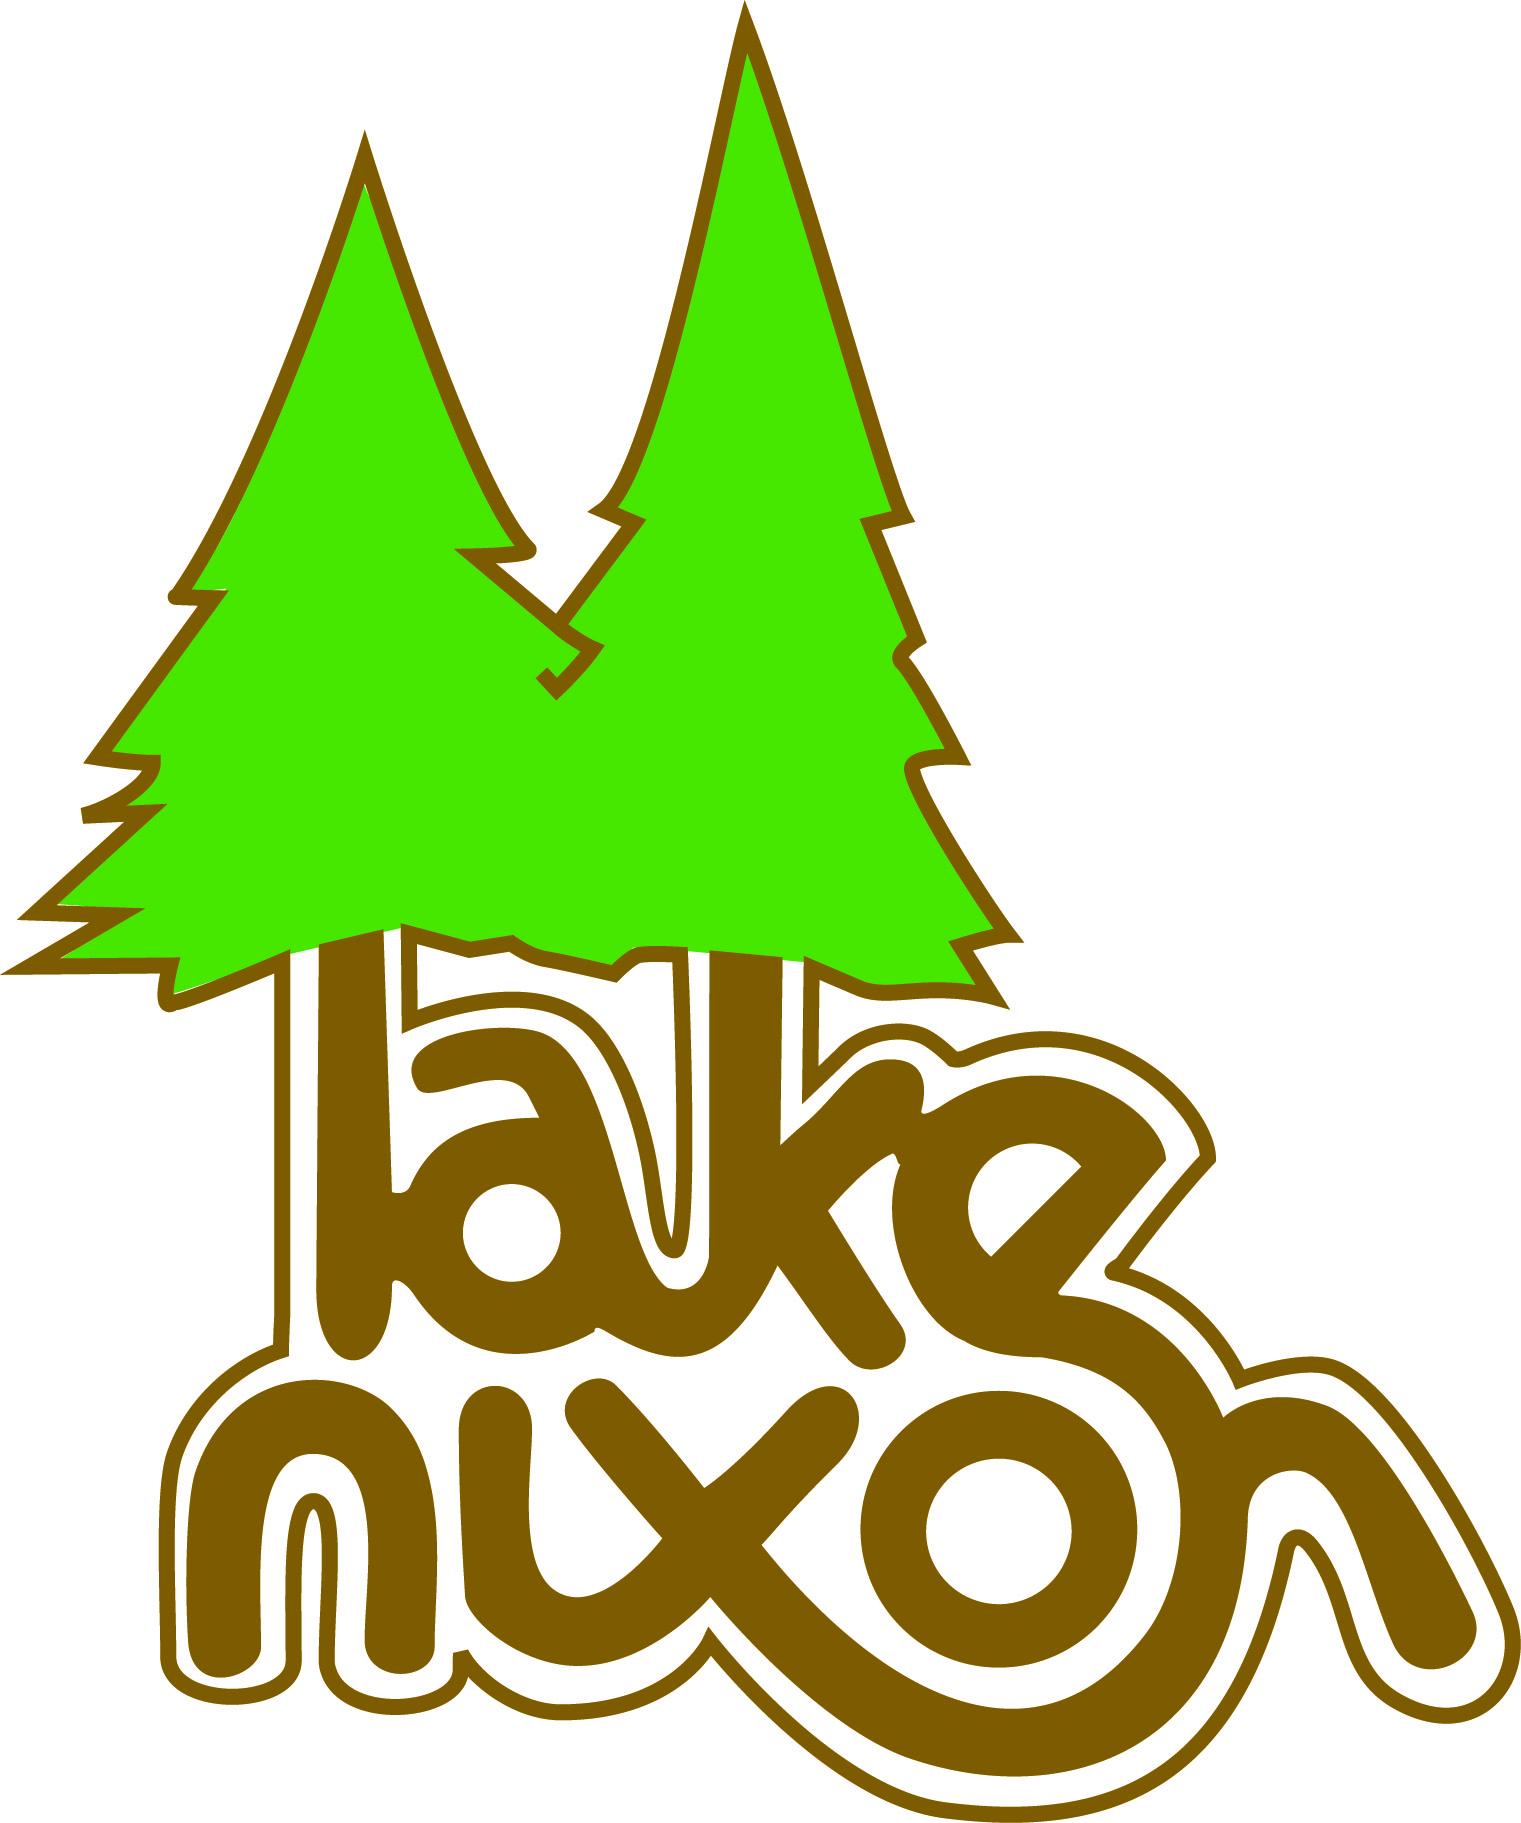 Lake Nixon BROWN AND GREEN logo.jpg